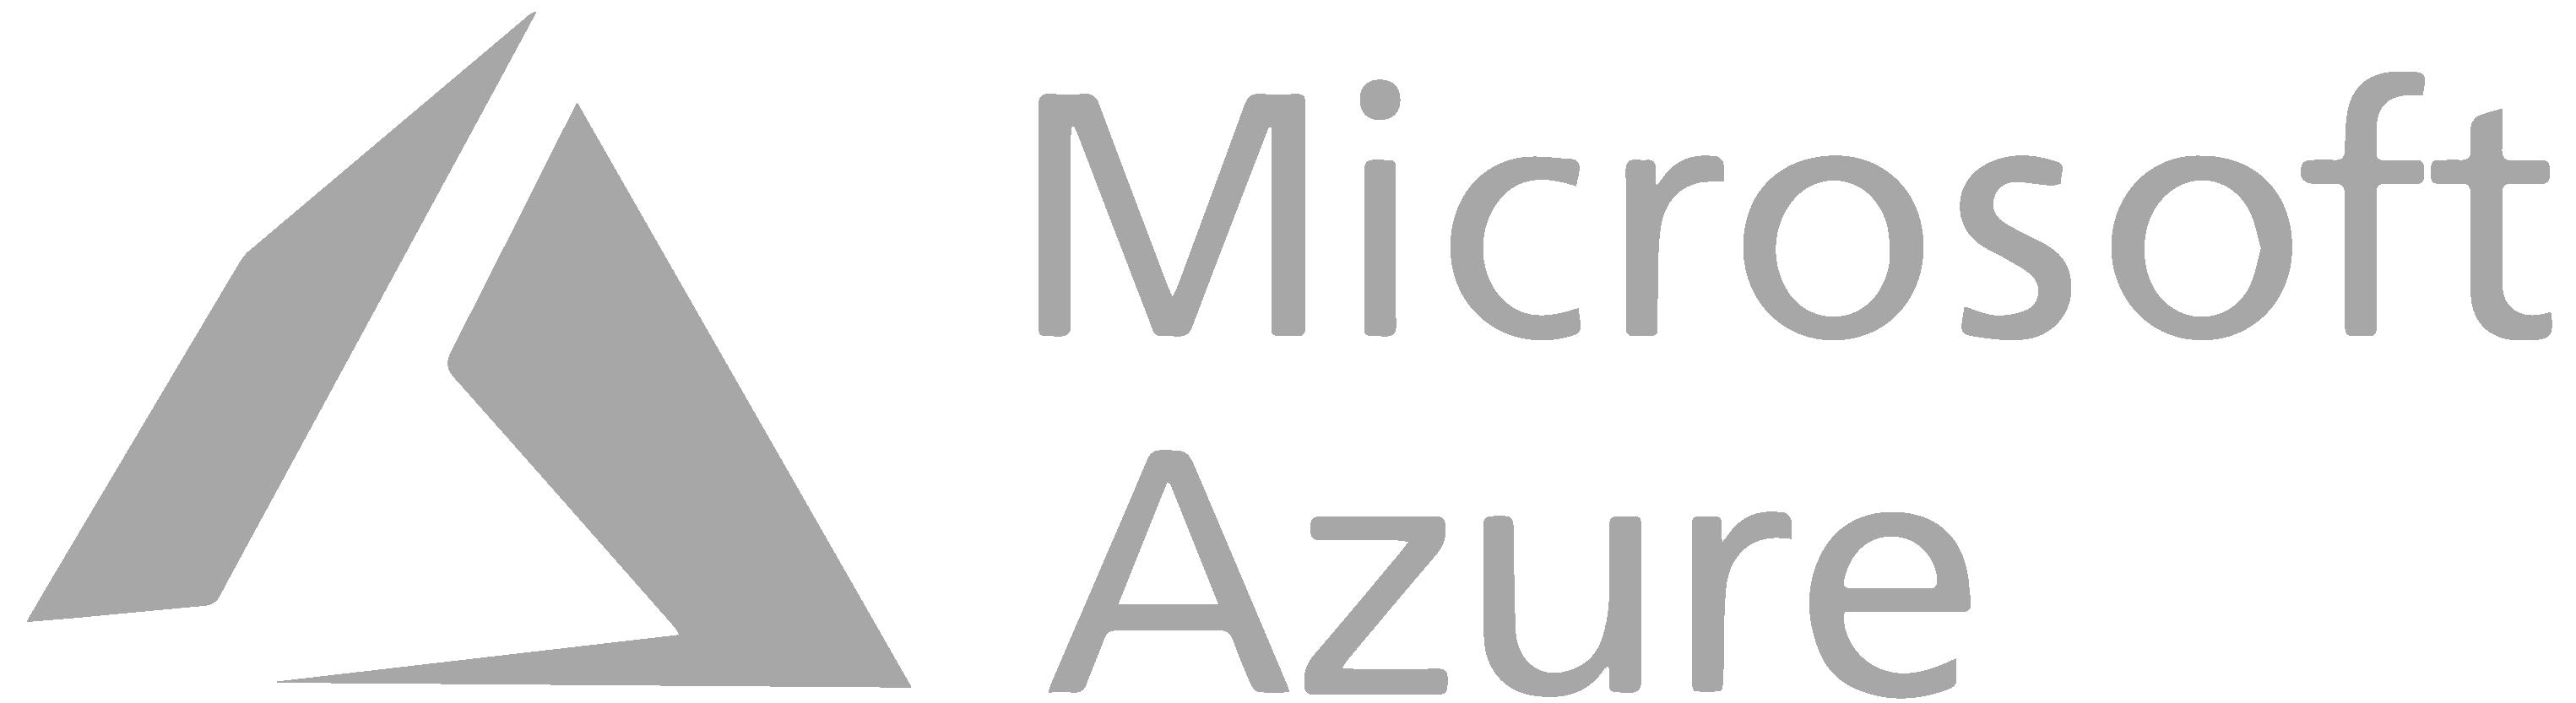 software development Microsoft Azure logo technology